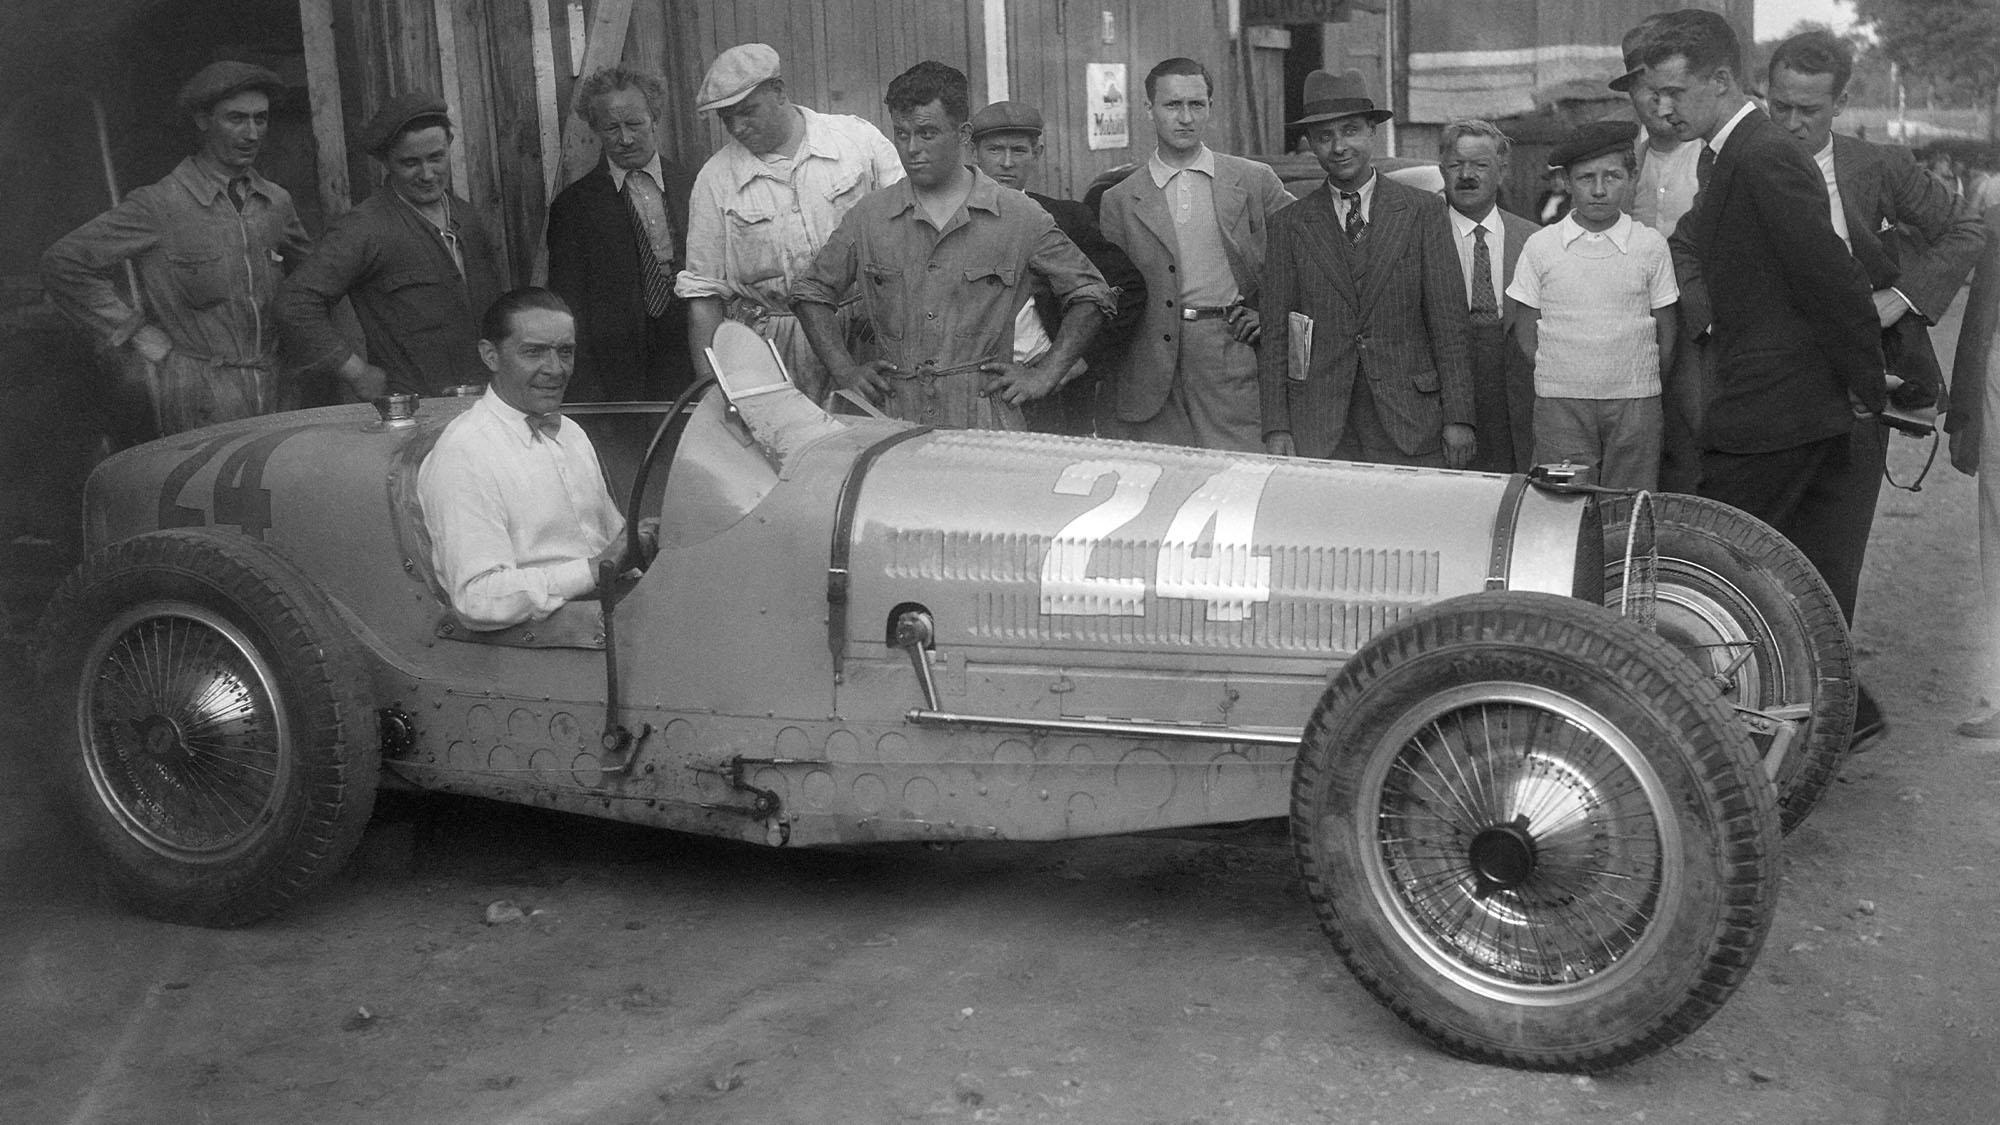 Robert Benoist, pilote automobile, en France en 1935. (Photo by Keystone-France/Gamma-Rapho via Getty Images)